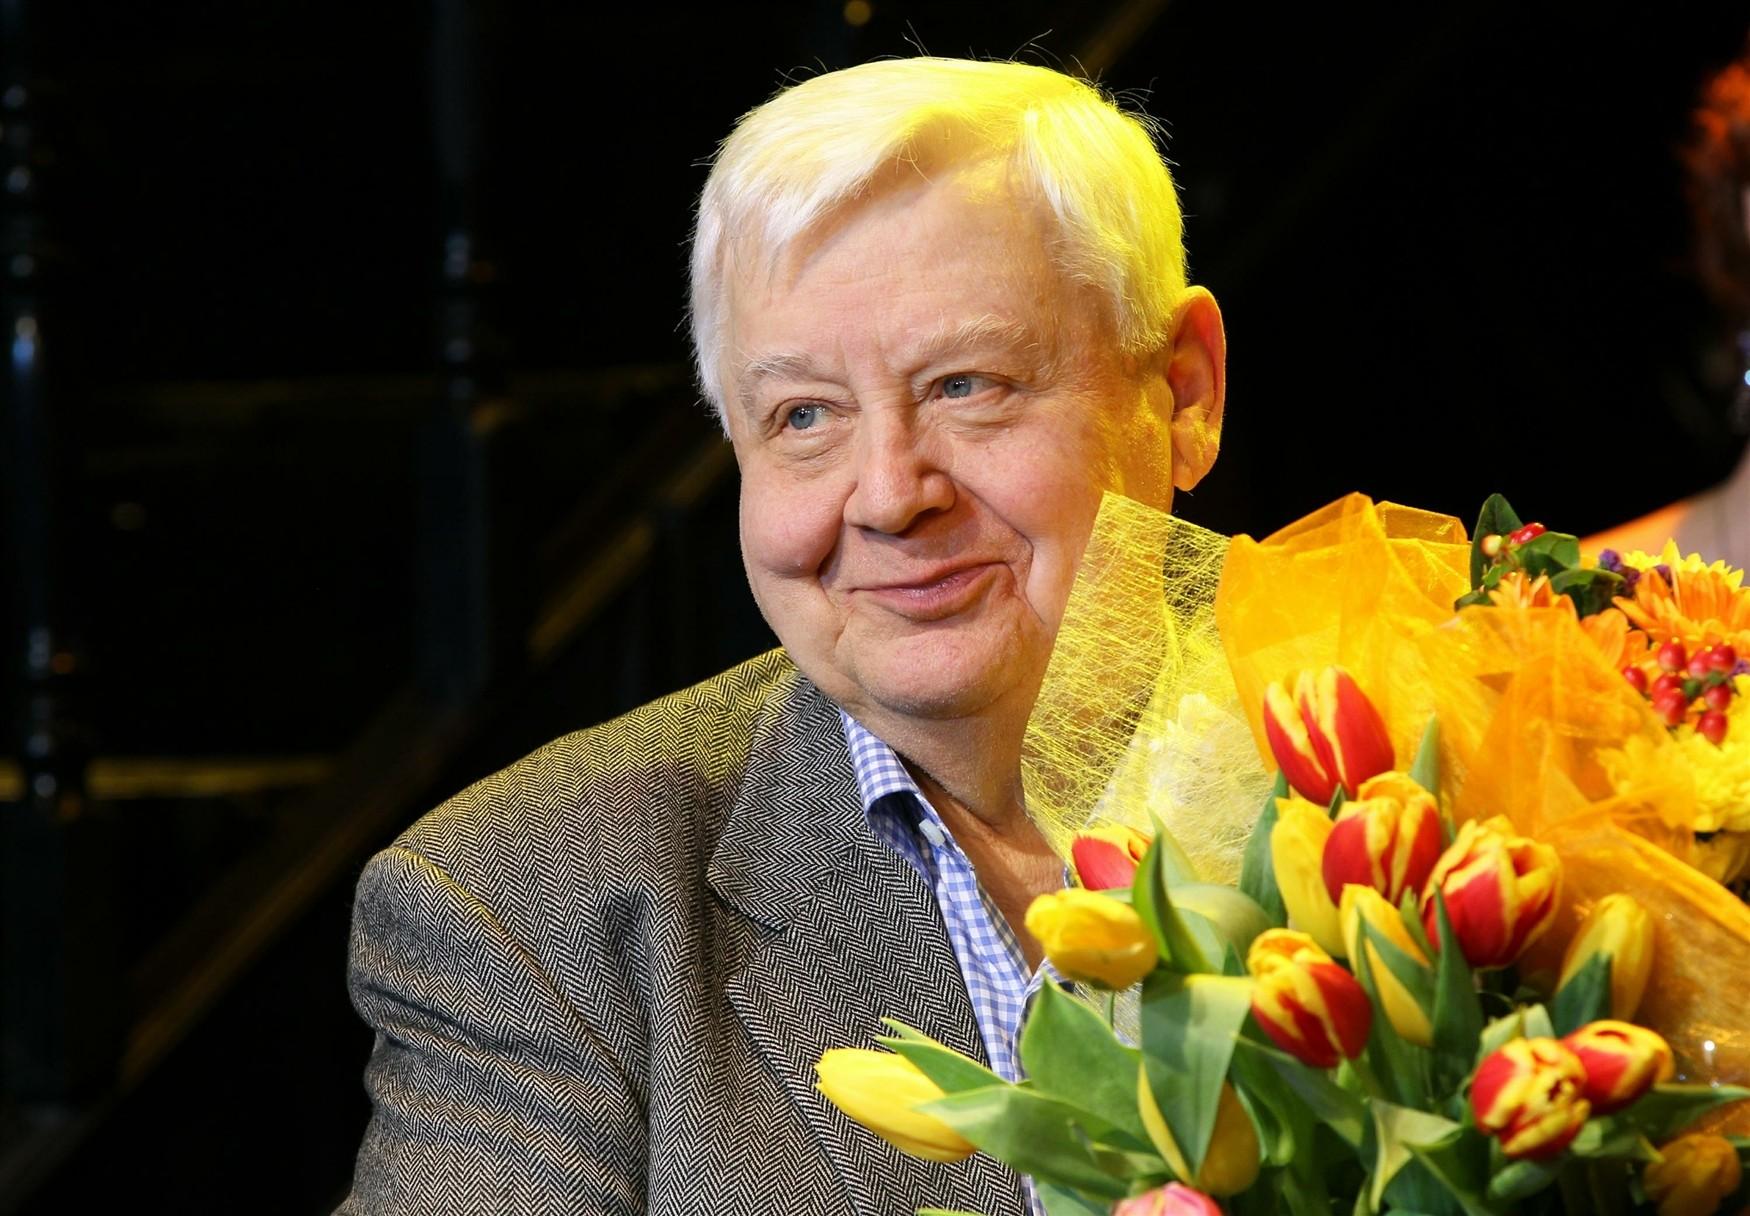 ВМХТ поведали опричинах госпитализации Олега Табакова